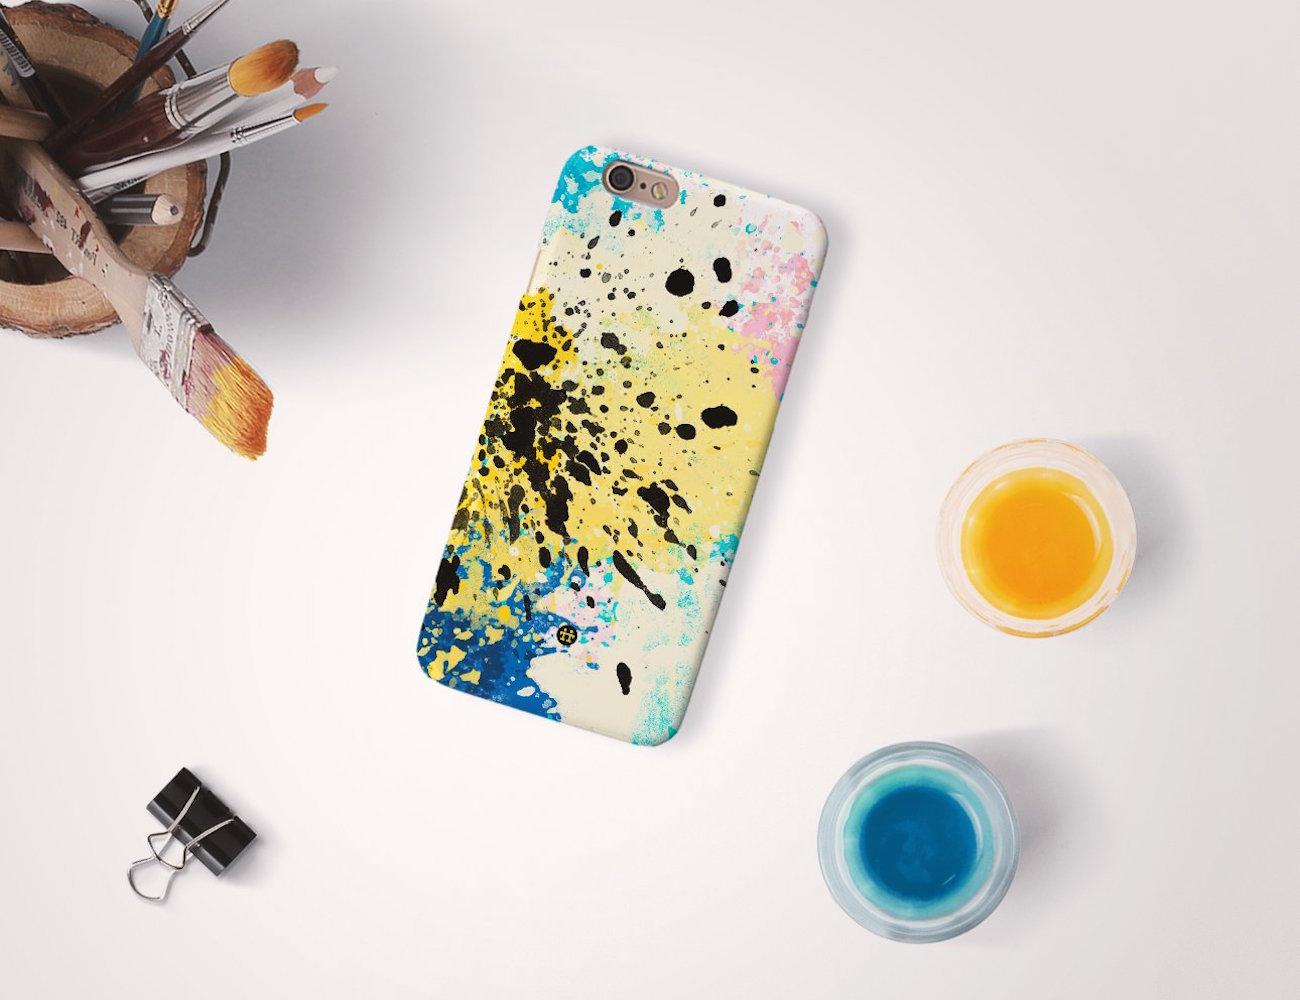 Case Design customized phone cases for galaxy s3 : CMYK Splash Art Phone Case by Madotta u00bb Gadget Flow